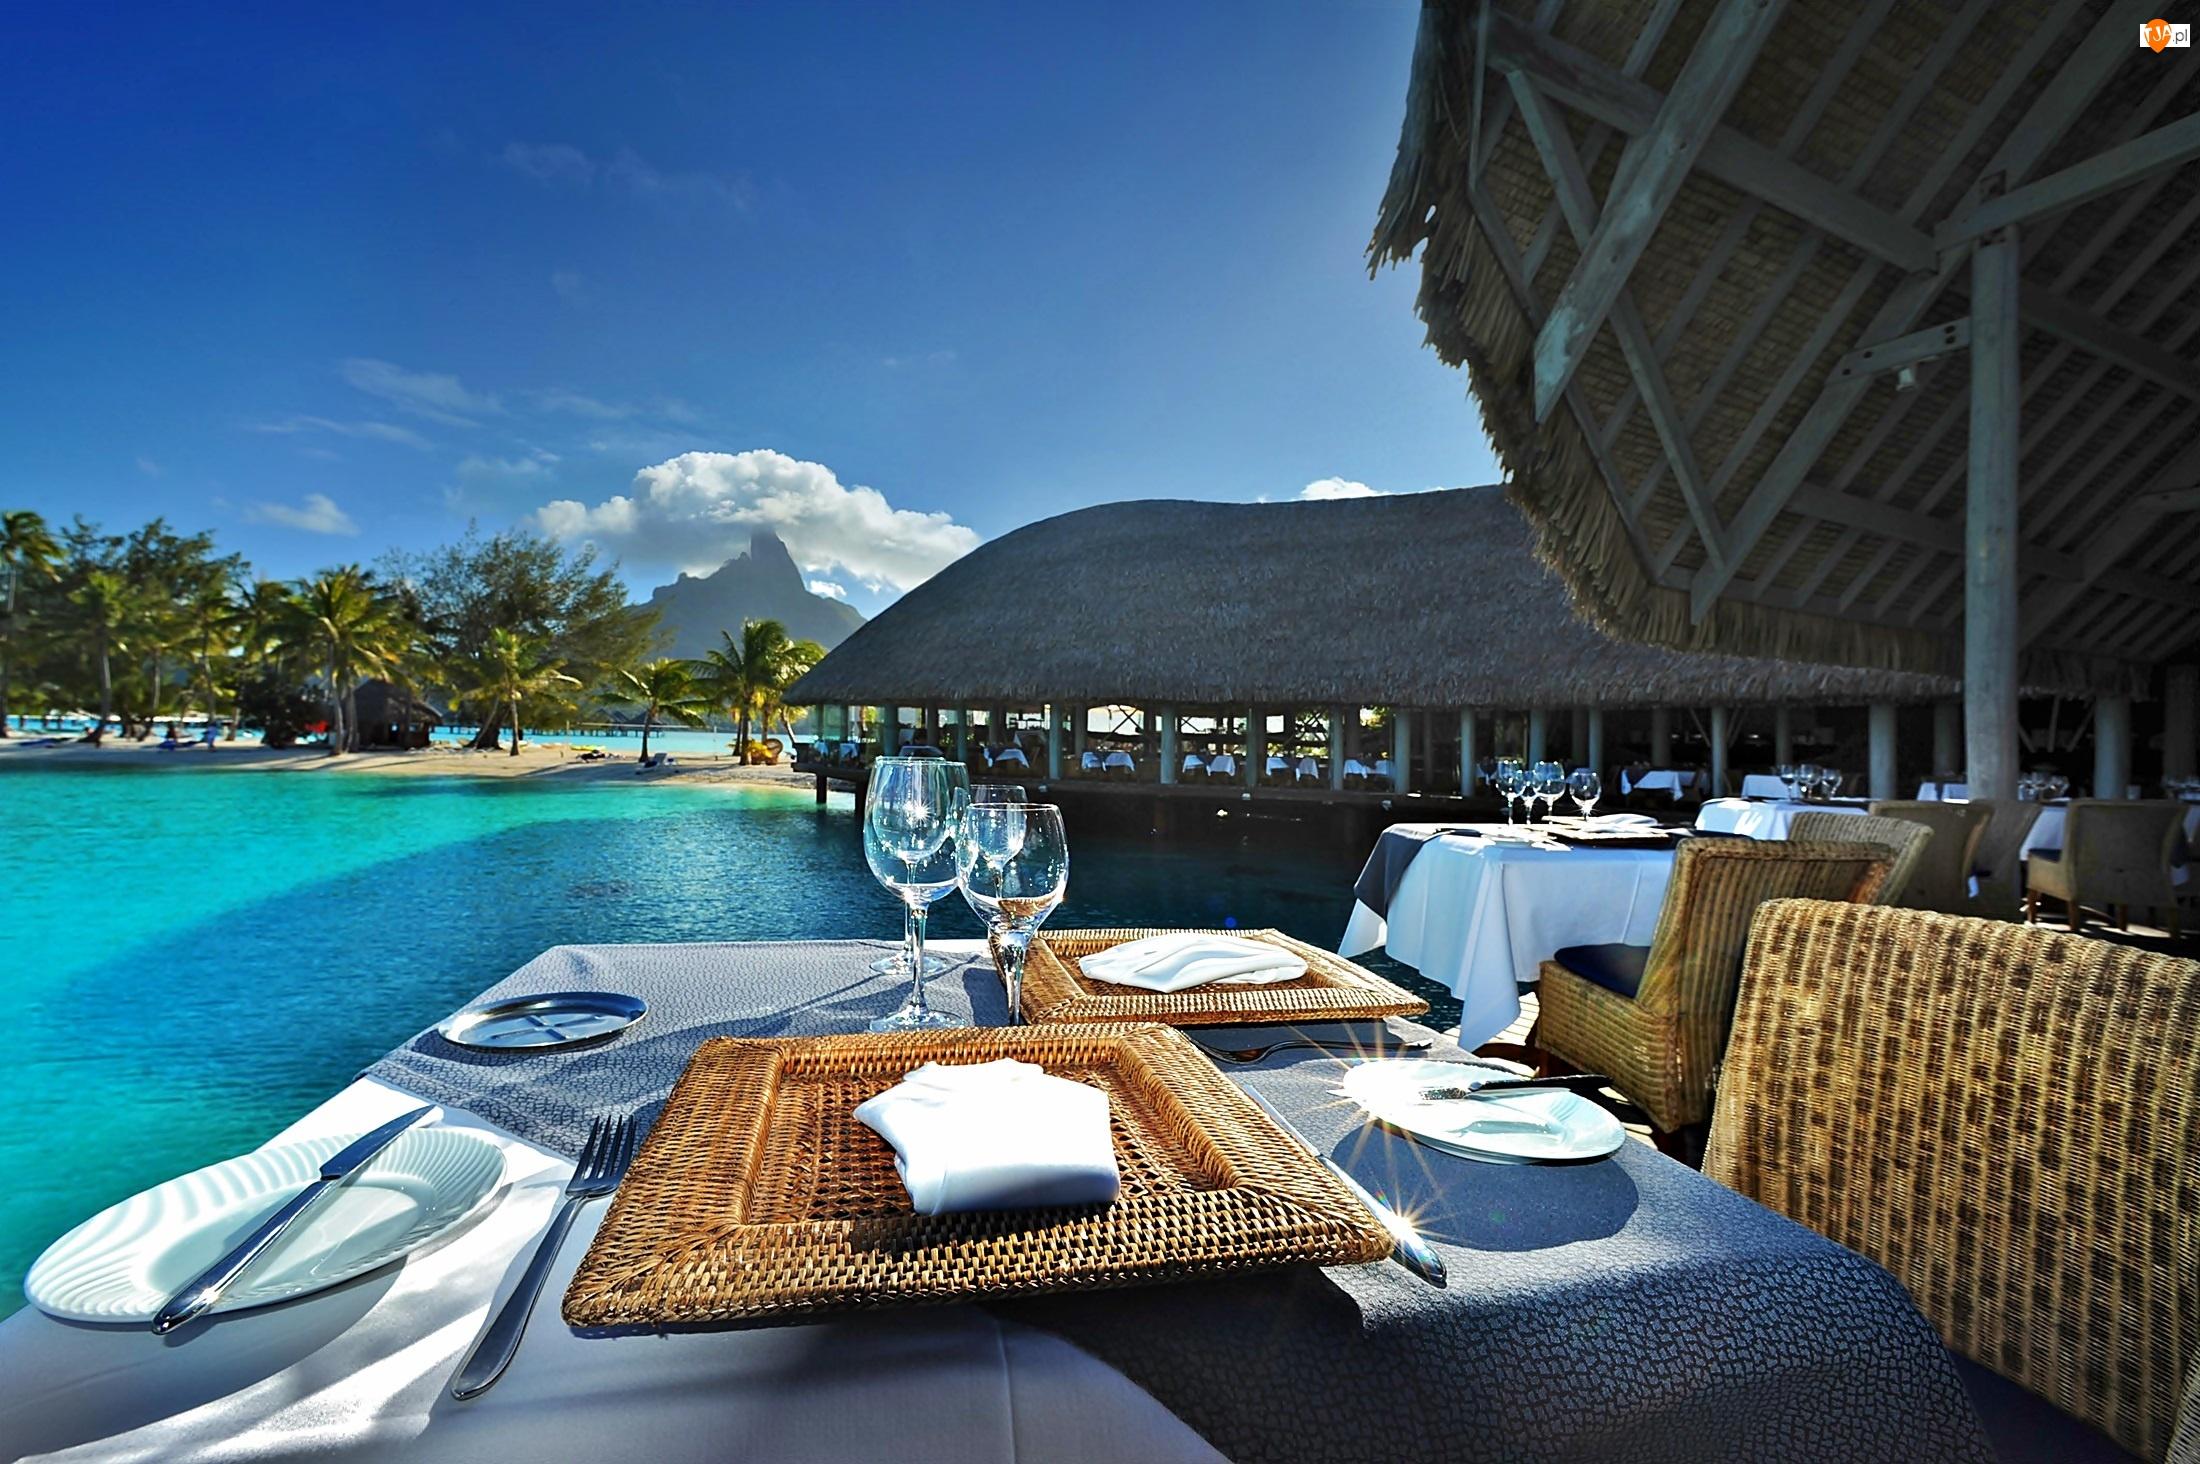 Morze, Polinezja Francuska, Laguna, Bora Bora, Restauracja